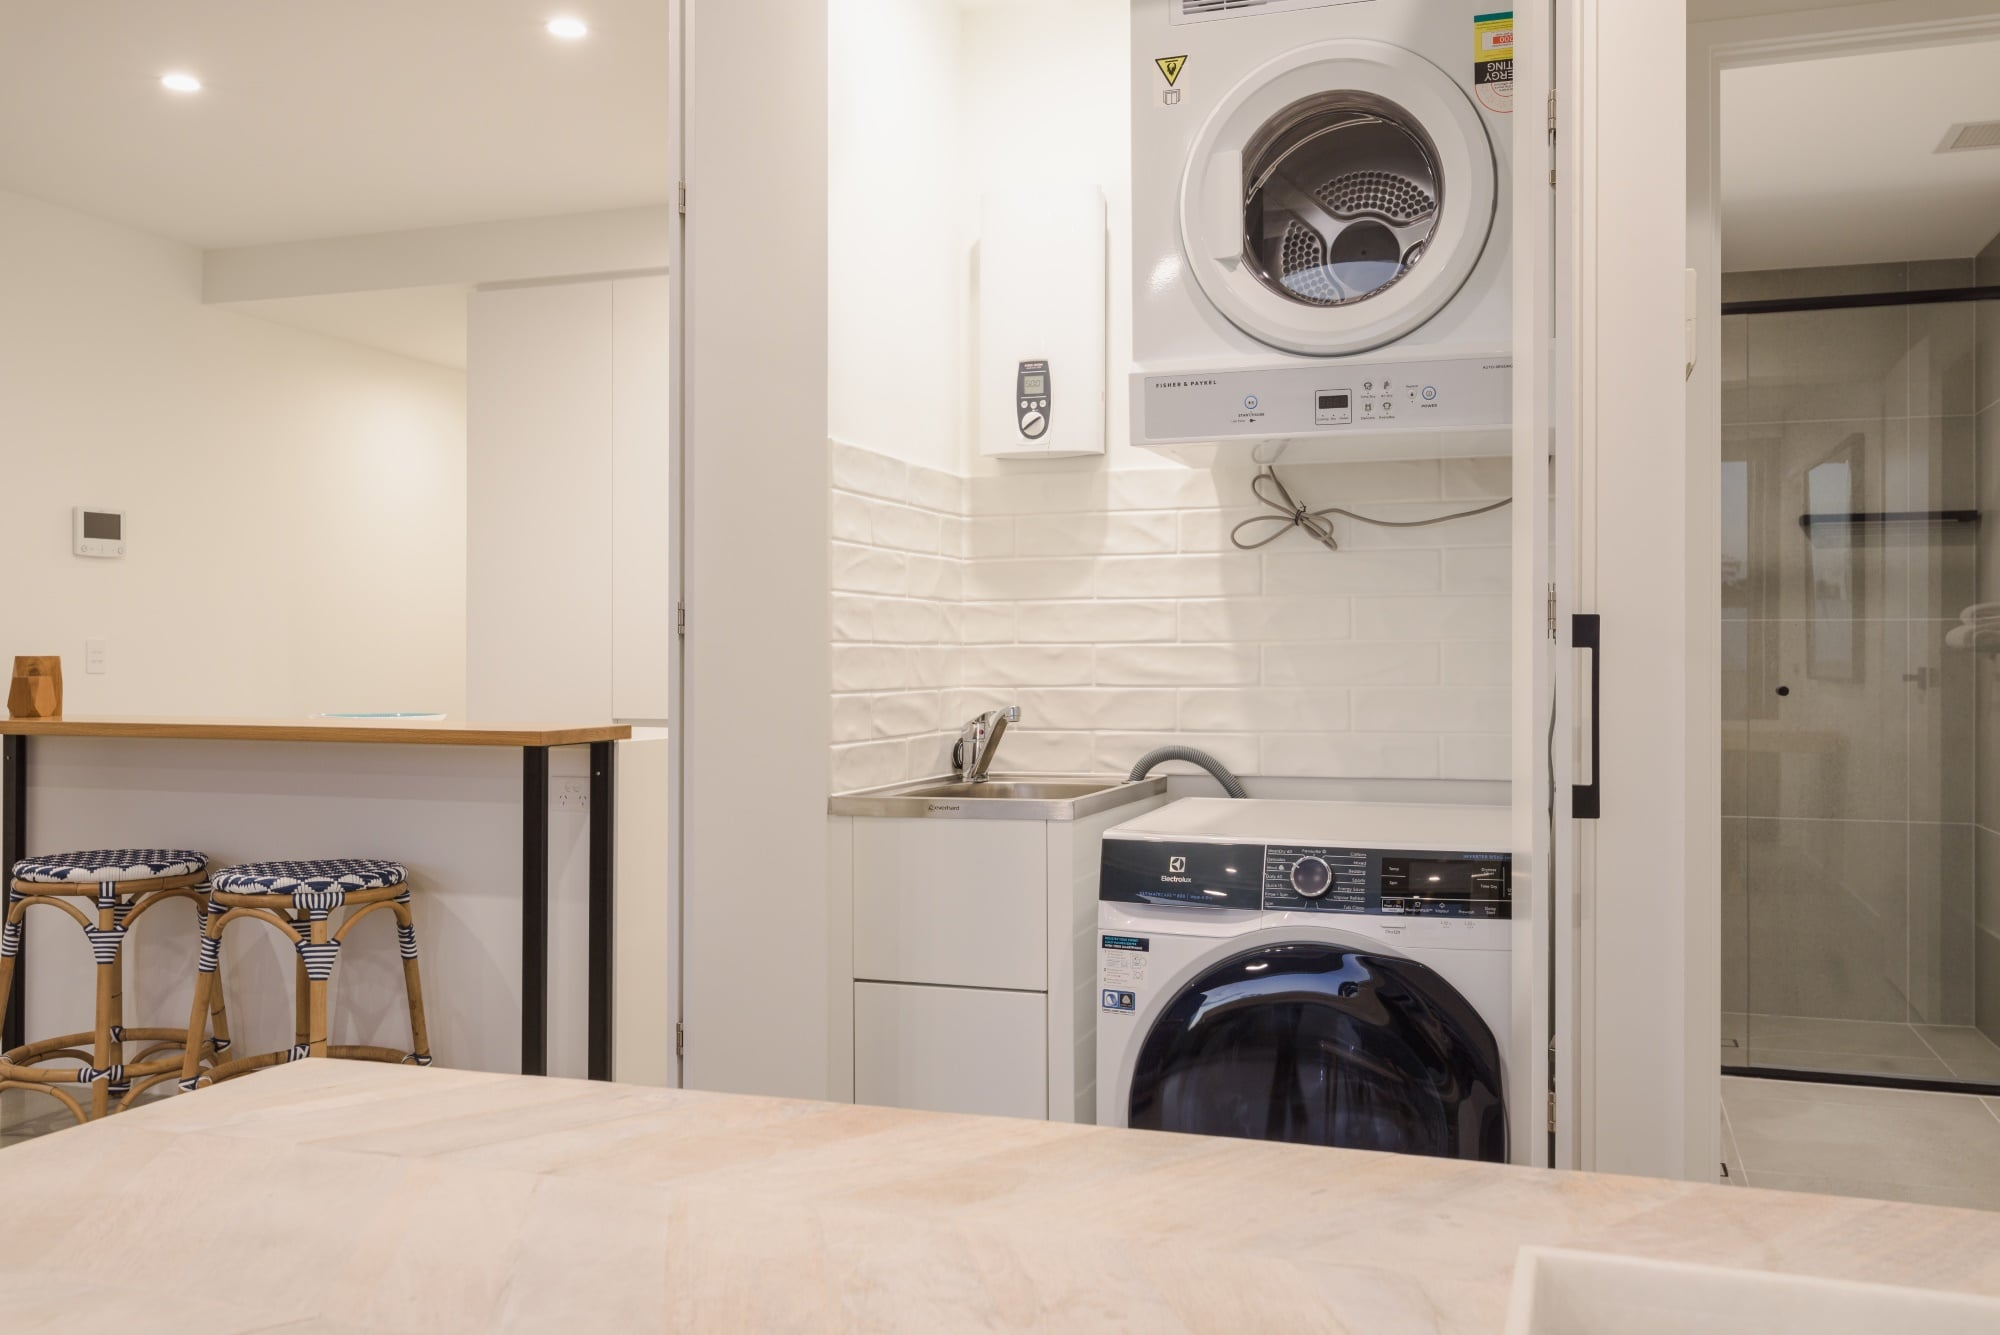 apartment-104-allure-mooloolaba-12